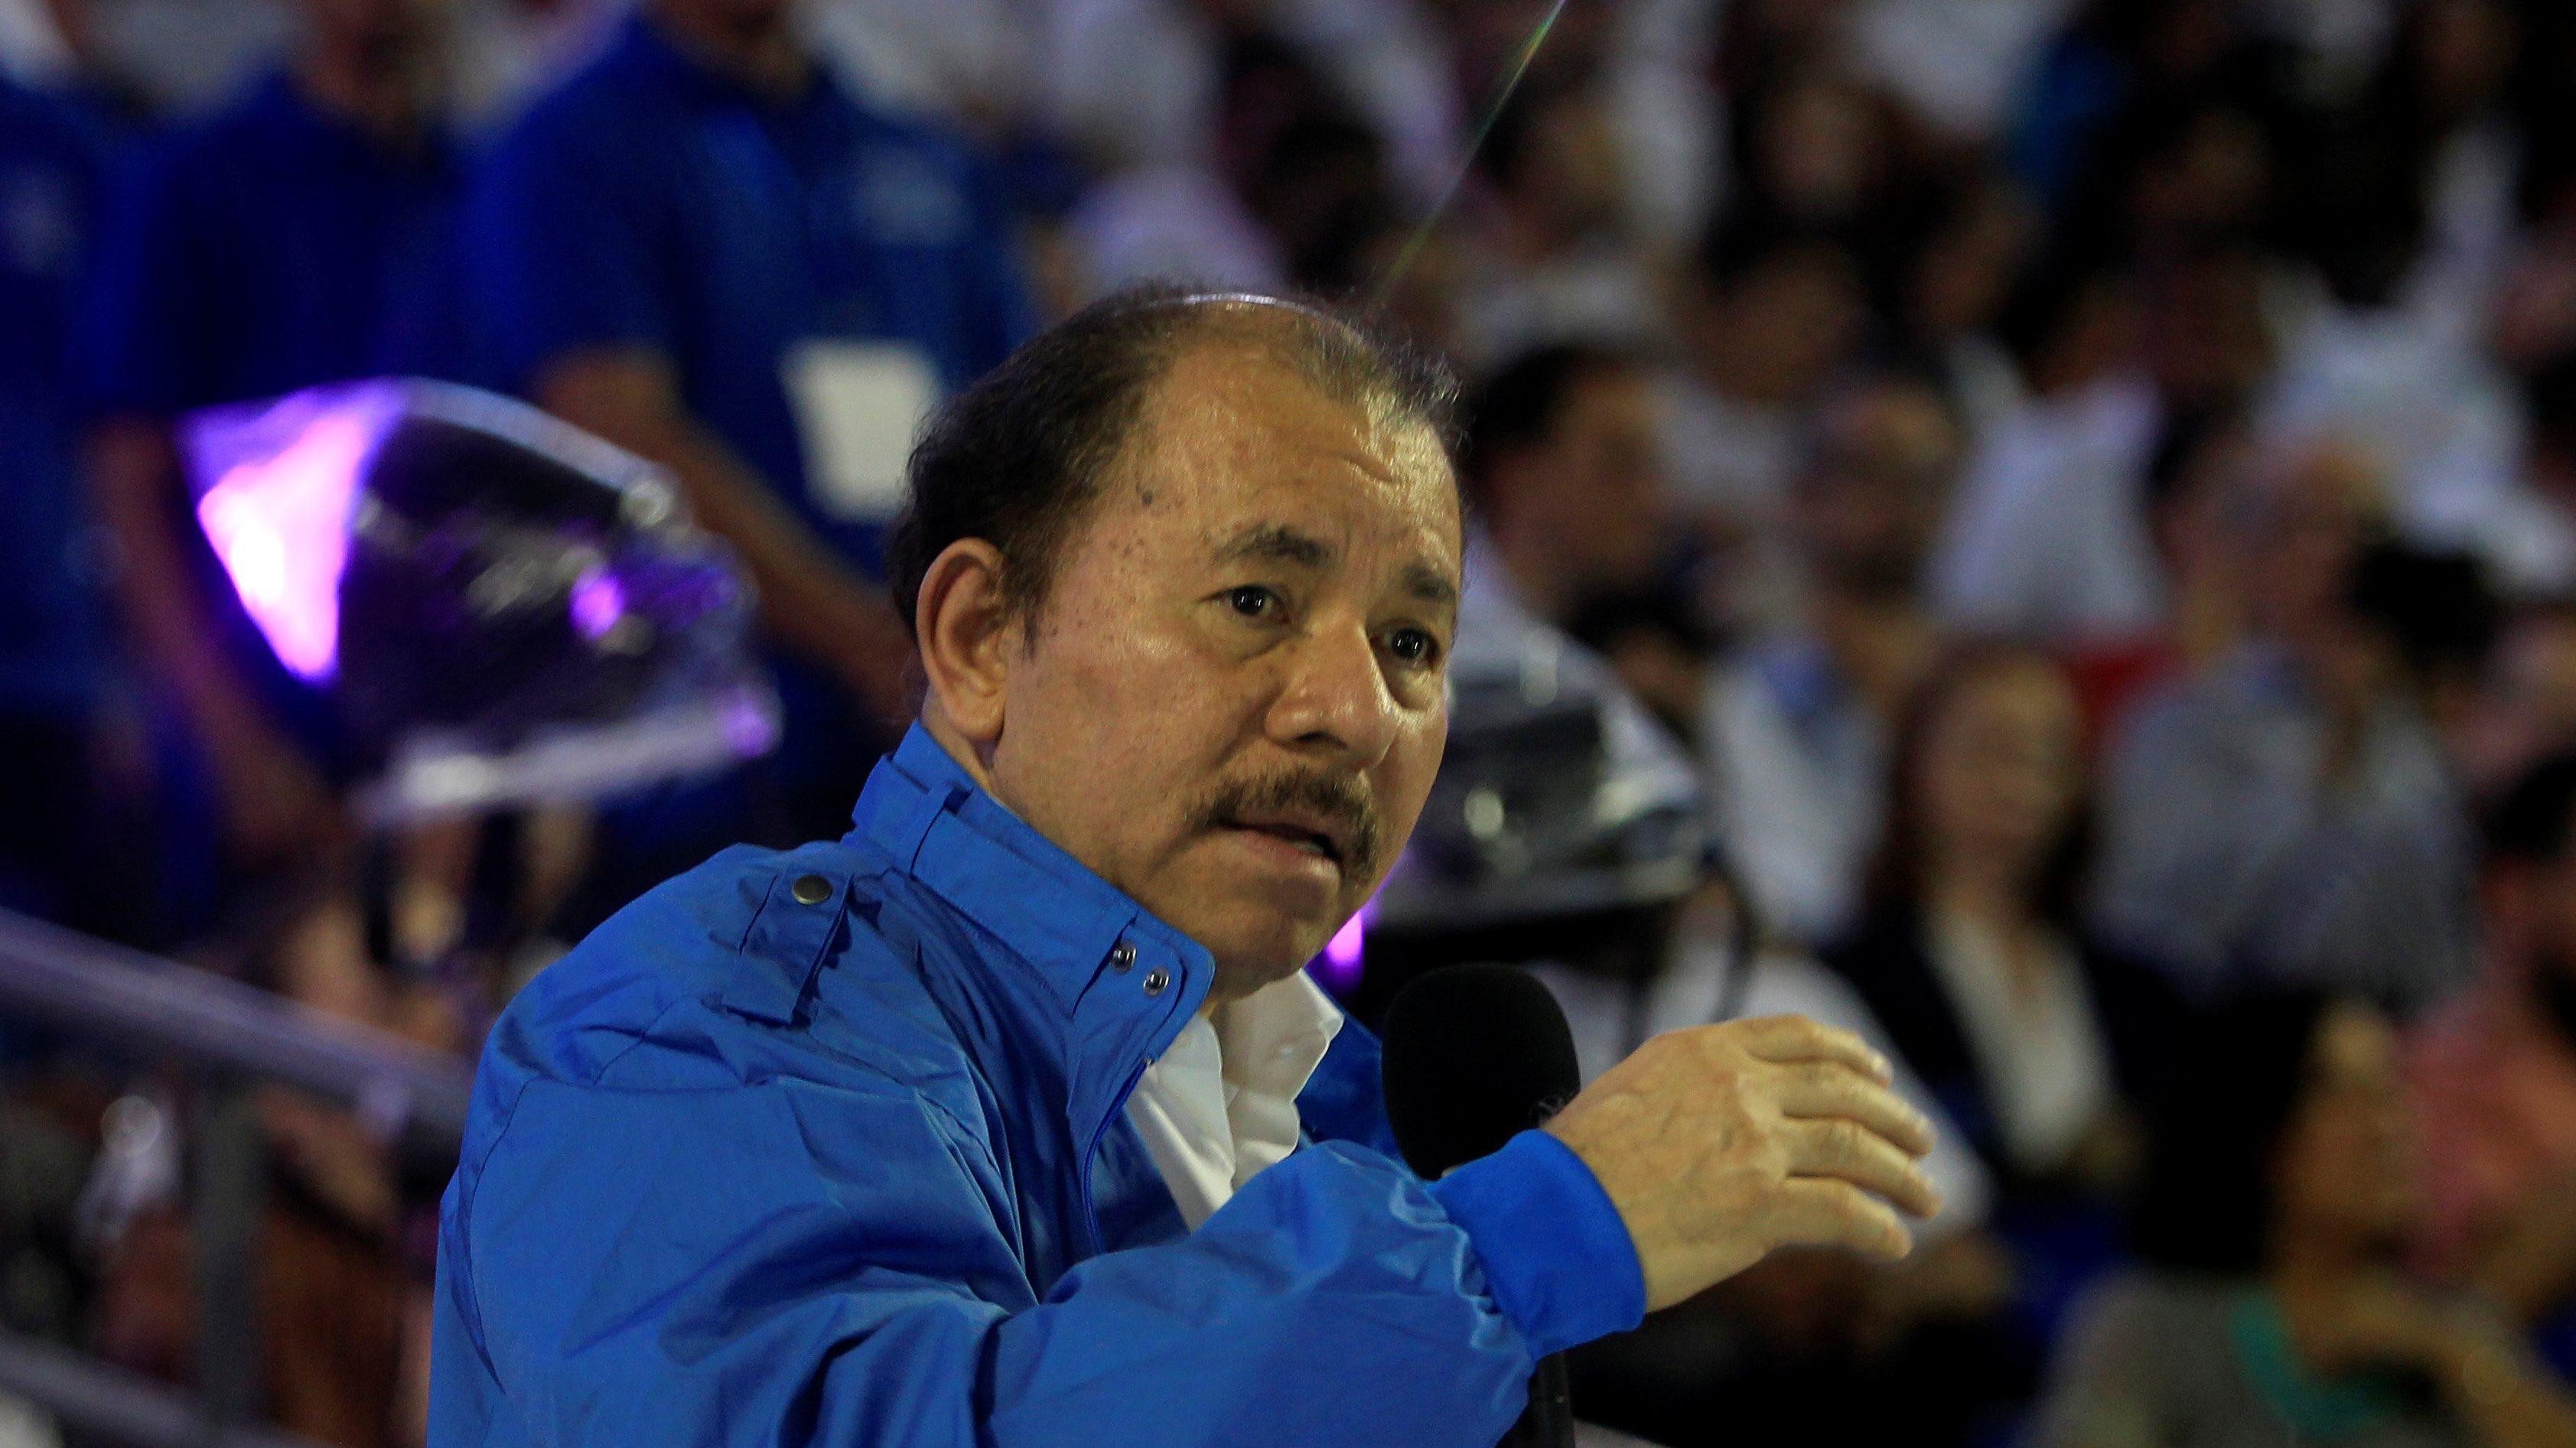 Nicaragua's President Daniel Ortega speaks during the inauguration of the new baseball stadium Dennis Martinez in Managua, Nicaragua. October 19,2017.